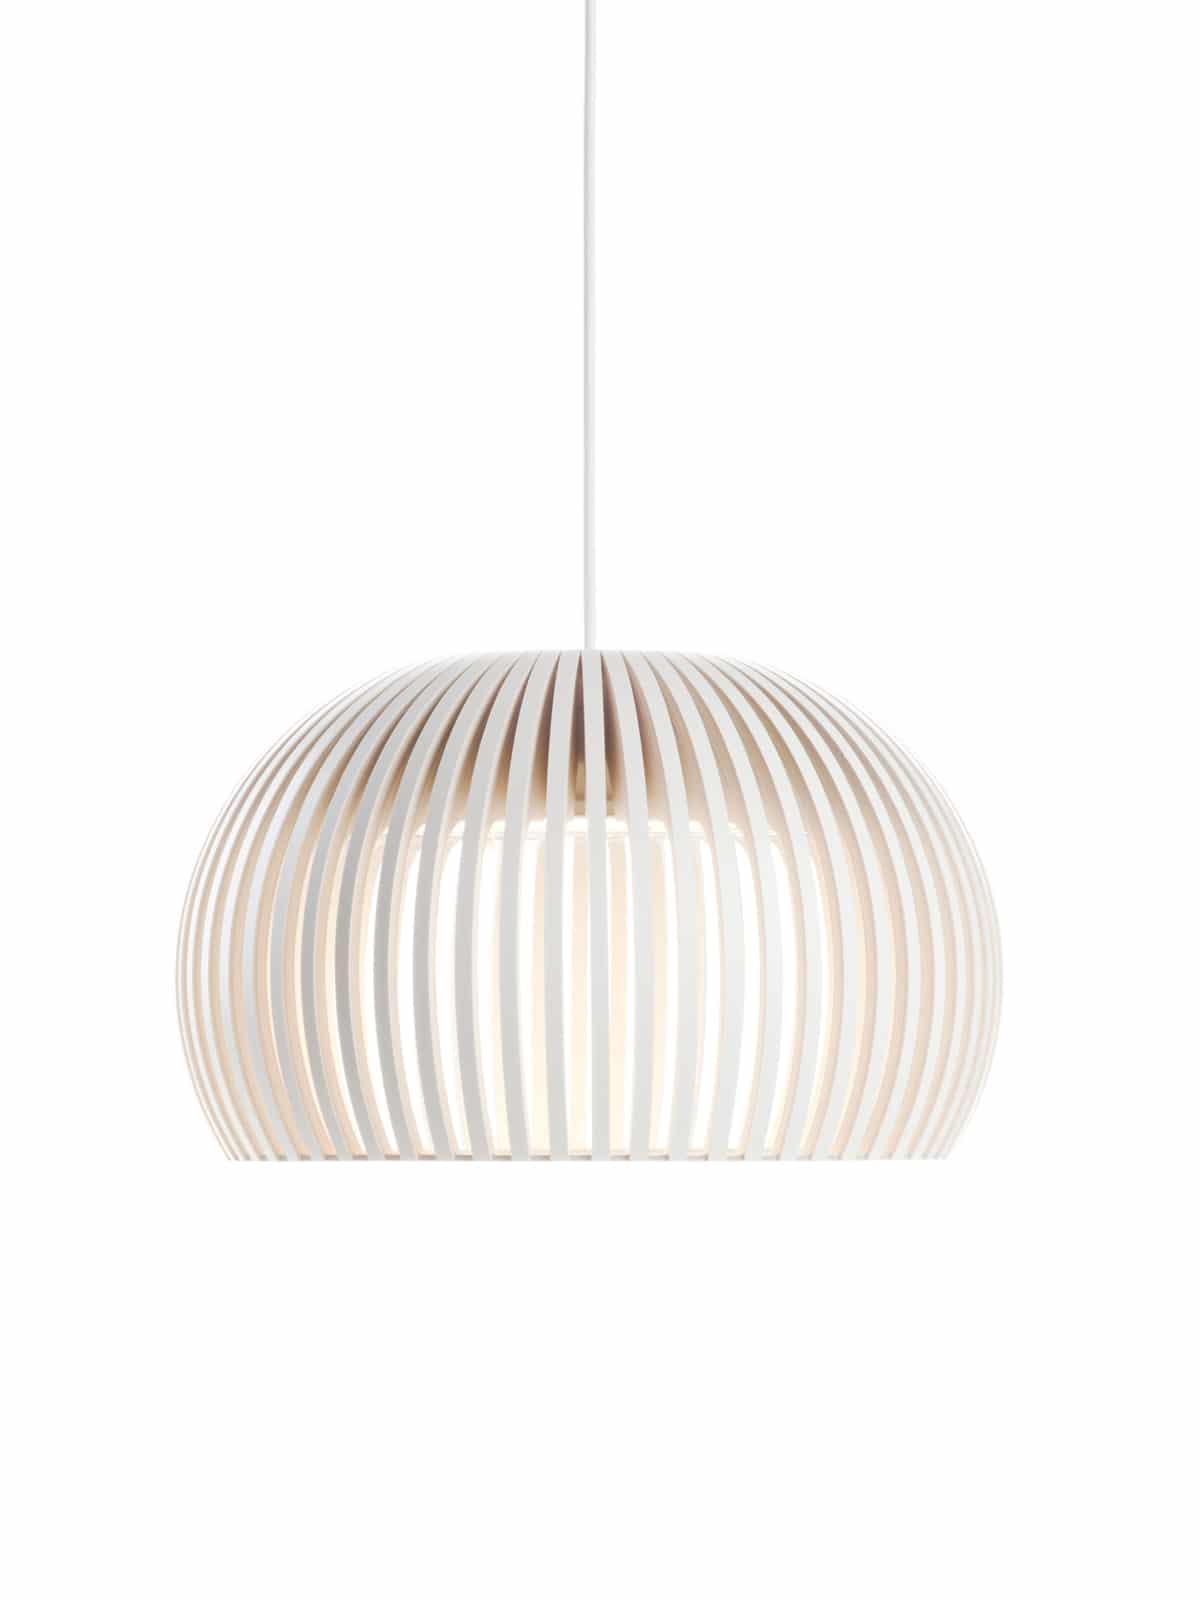 Atto 5000 Secto Design DesignOrt Lampen Berlin Onlineshop